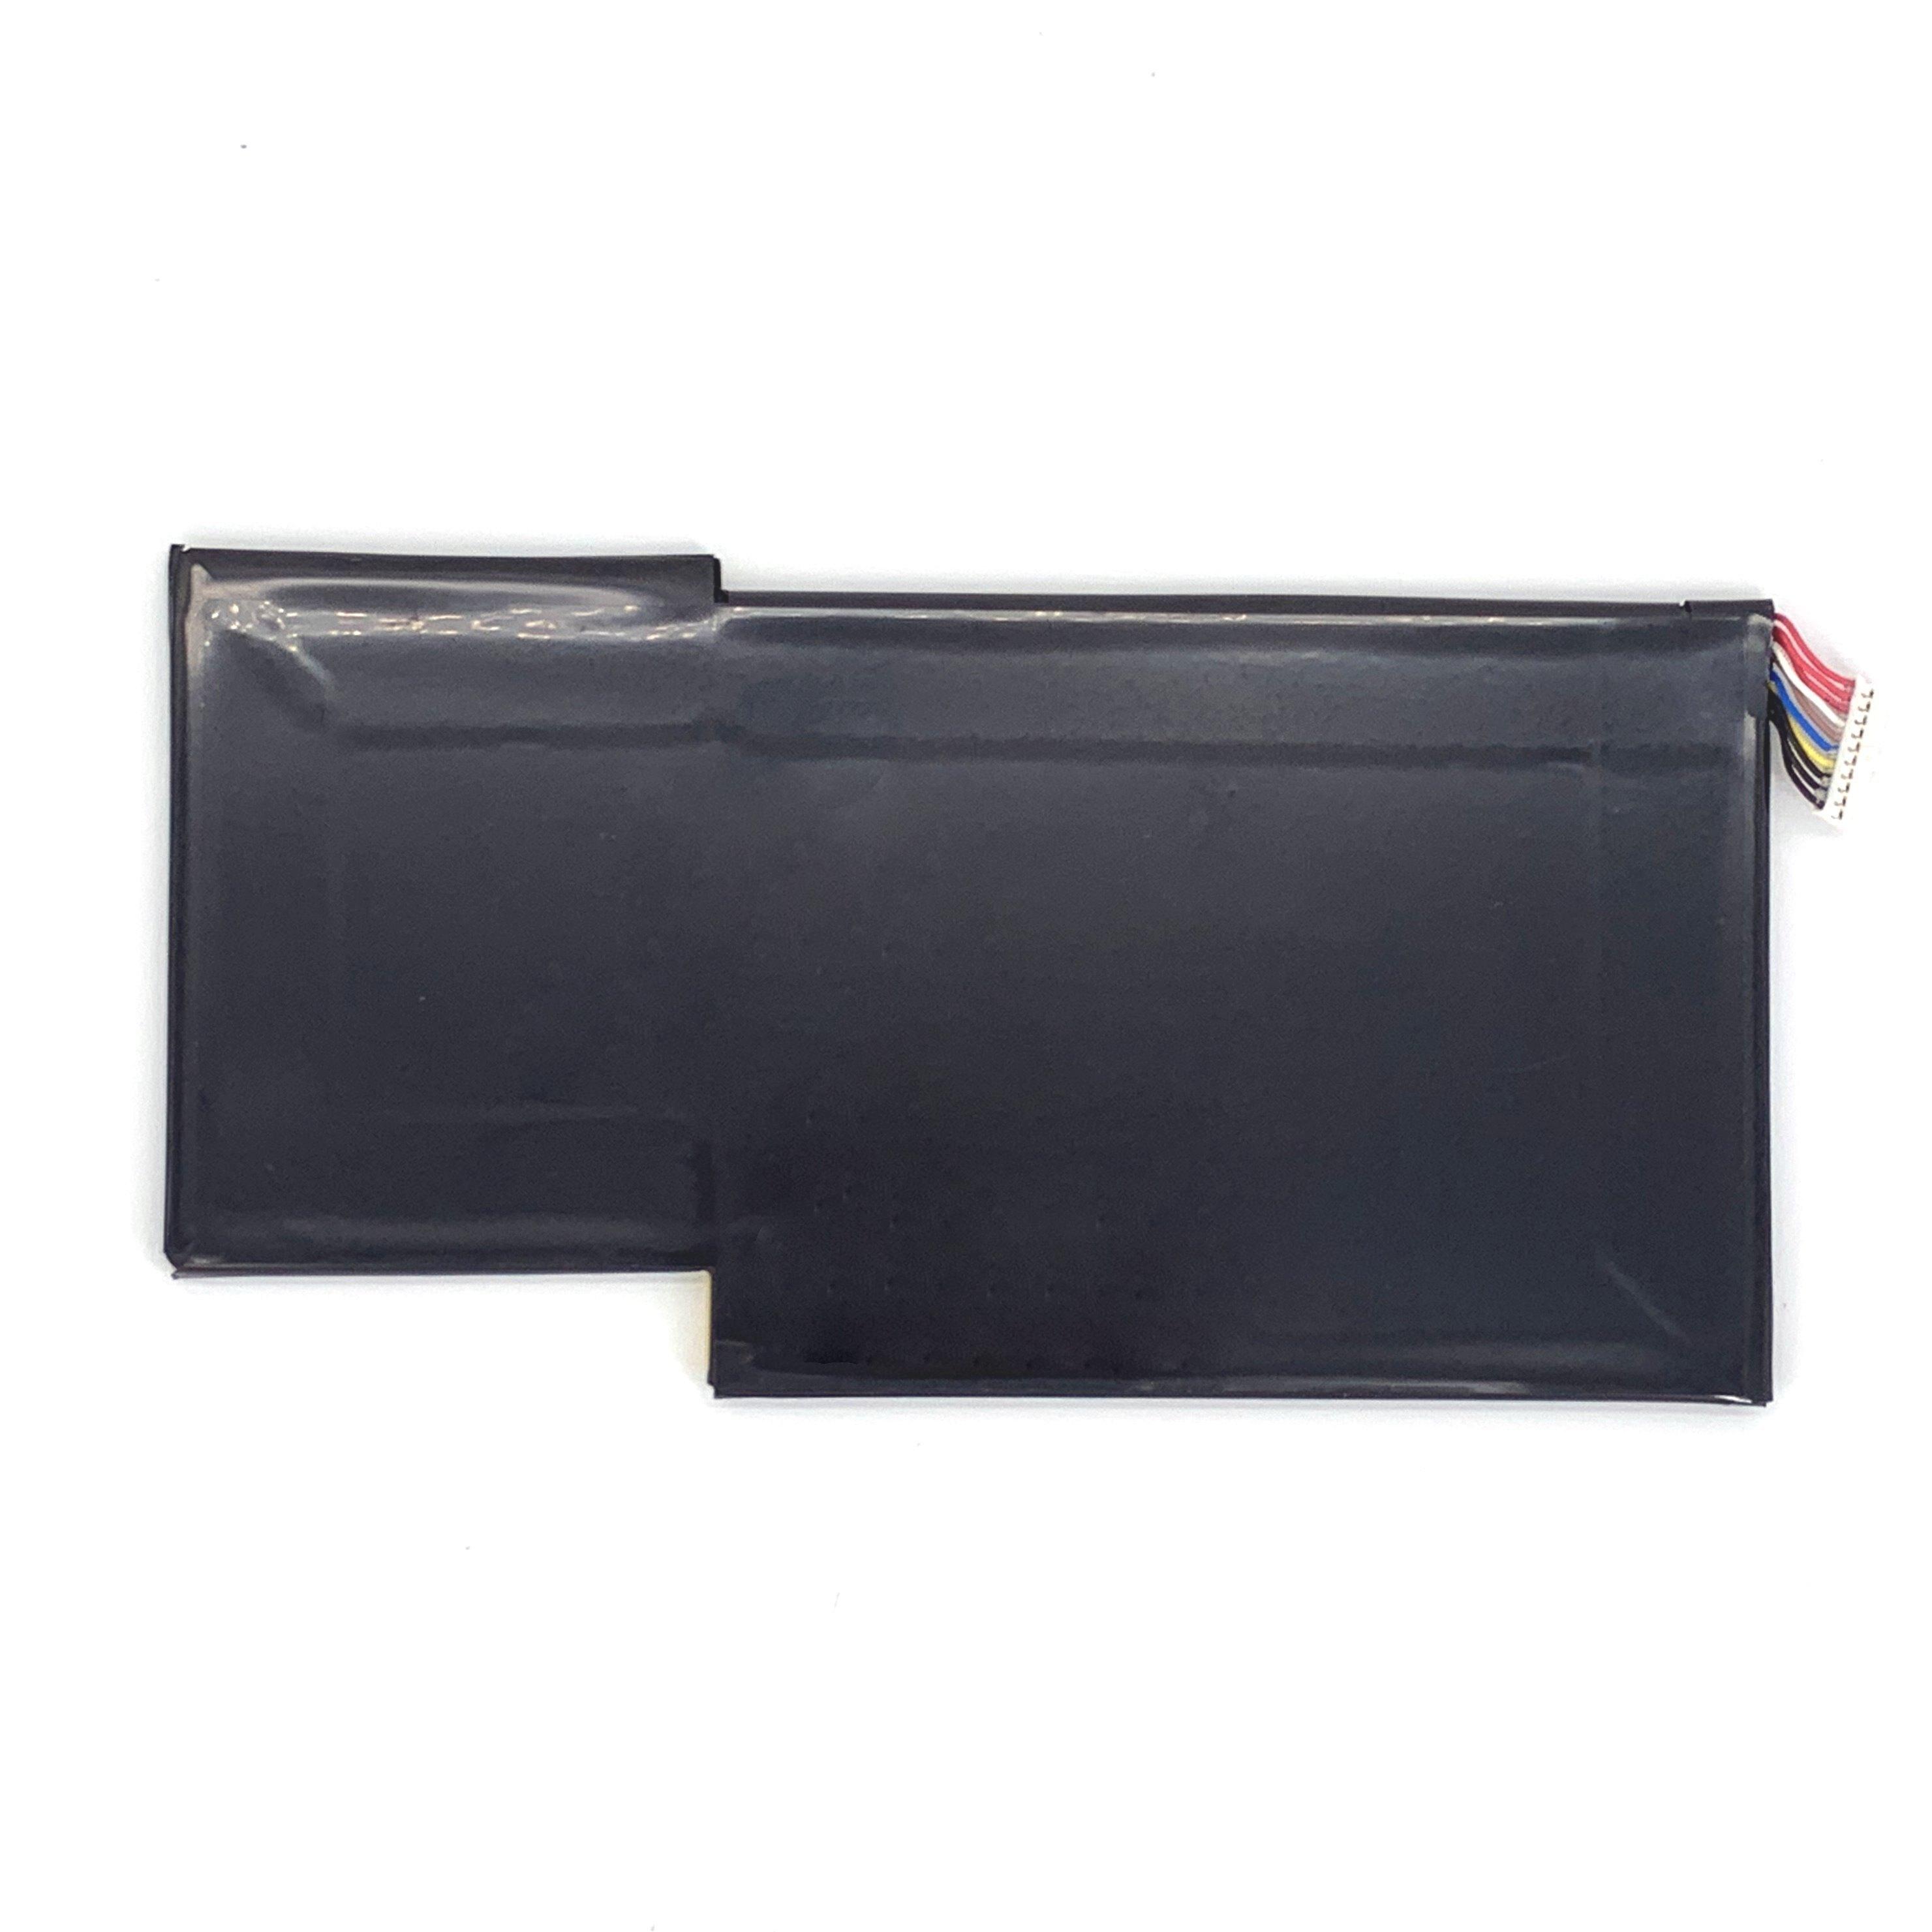 MSI BTY-M6J 3芯 原廠電池 S63VR Stealth Pro 048 078 230 422 674 GS73 6RF 7RE 8RF 8RD 8RE 8RF Stealth Pro 0